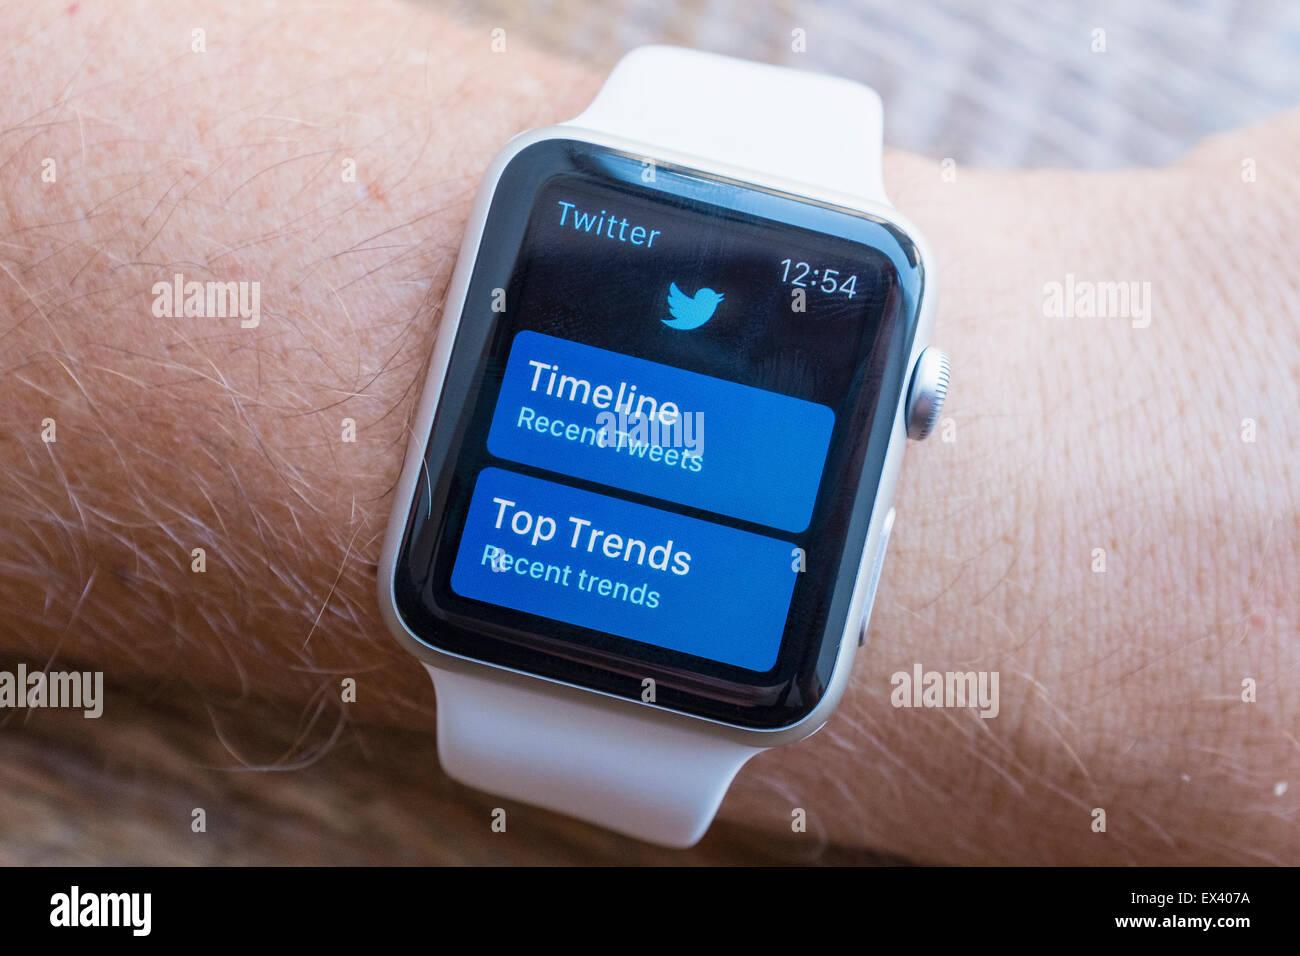 Twitter social media app on an Apple Watch - Stock Image